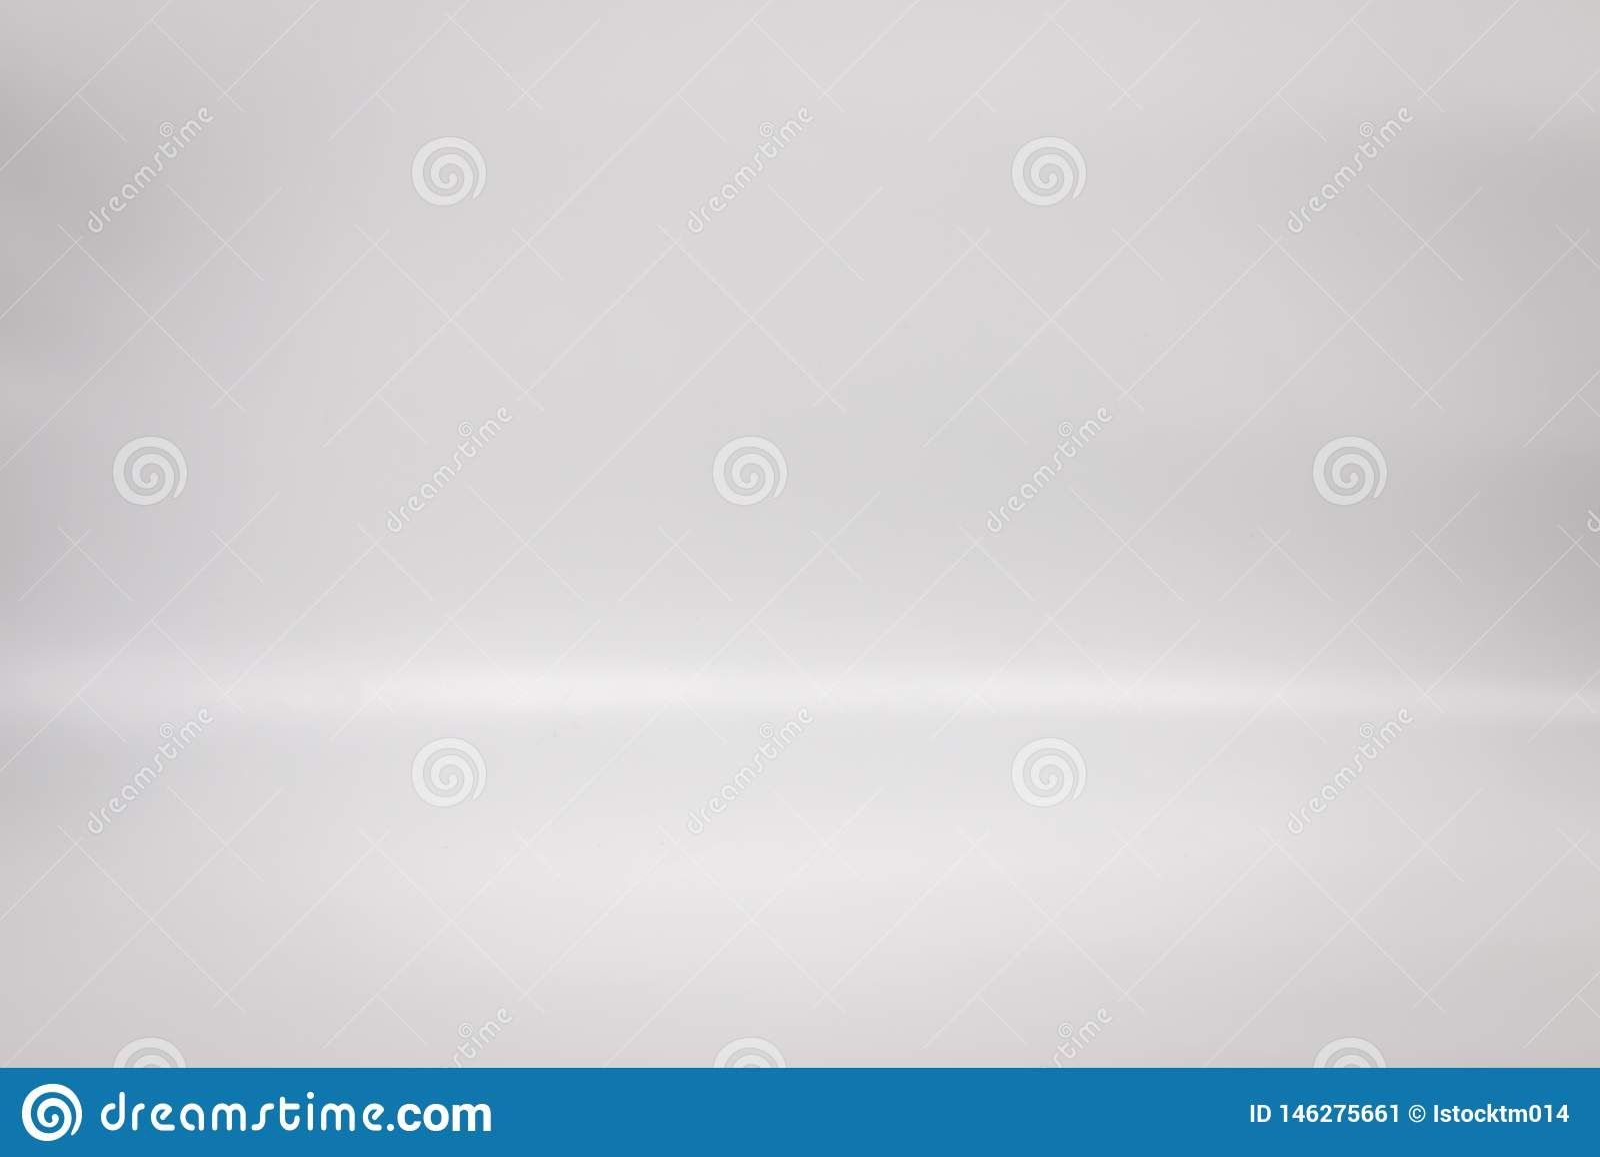 White backdrop for your product. Studio floor background. Blank interior gray scene